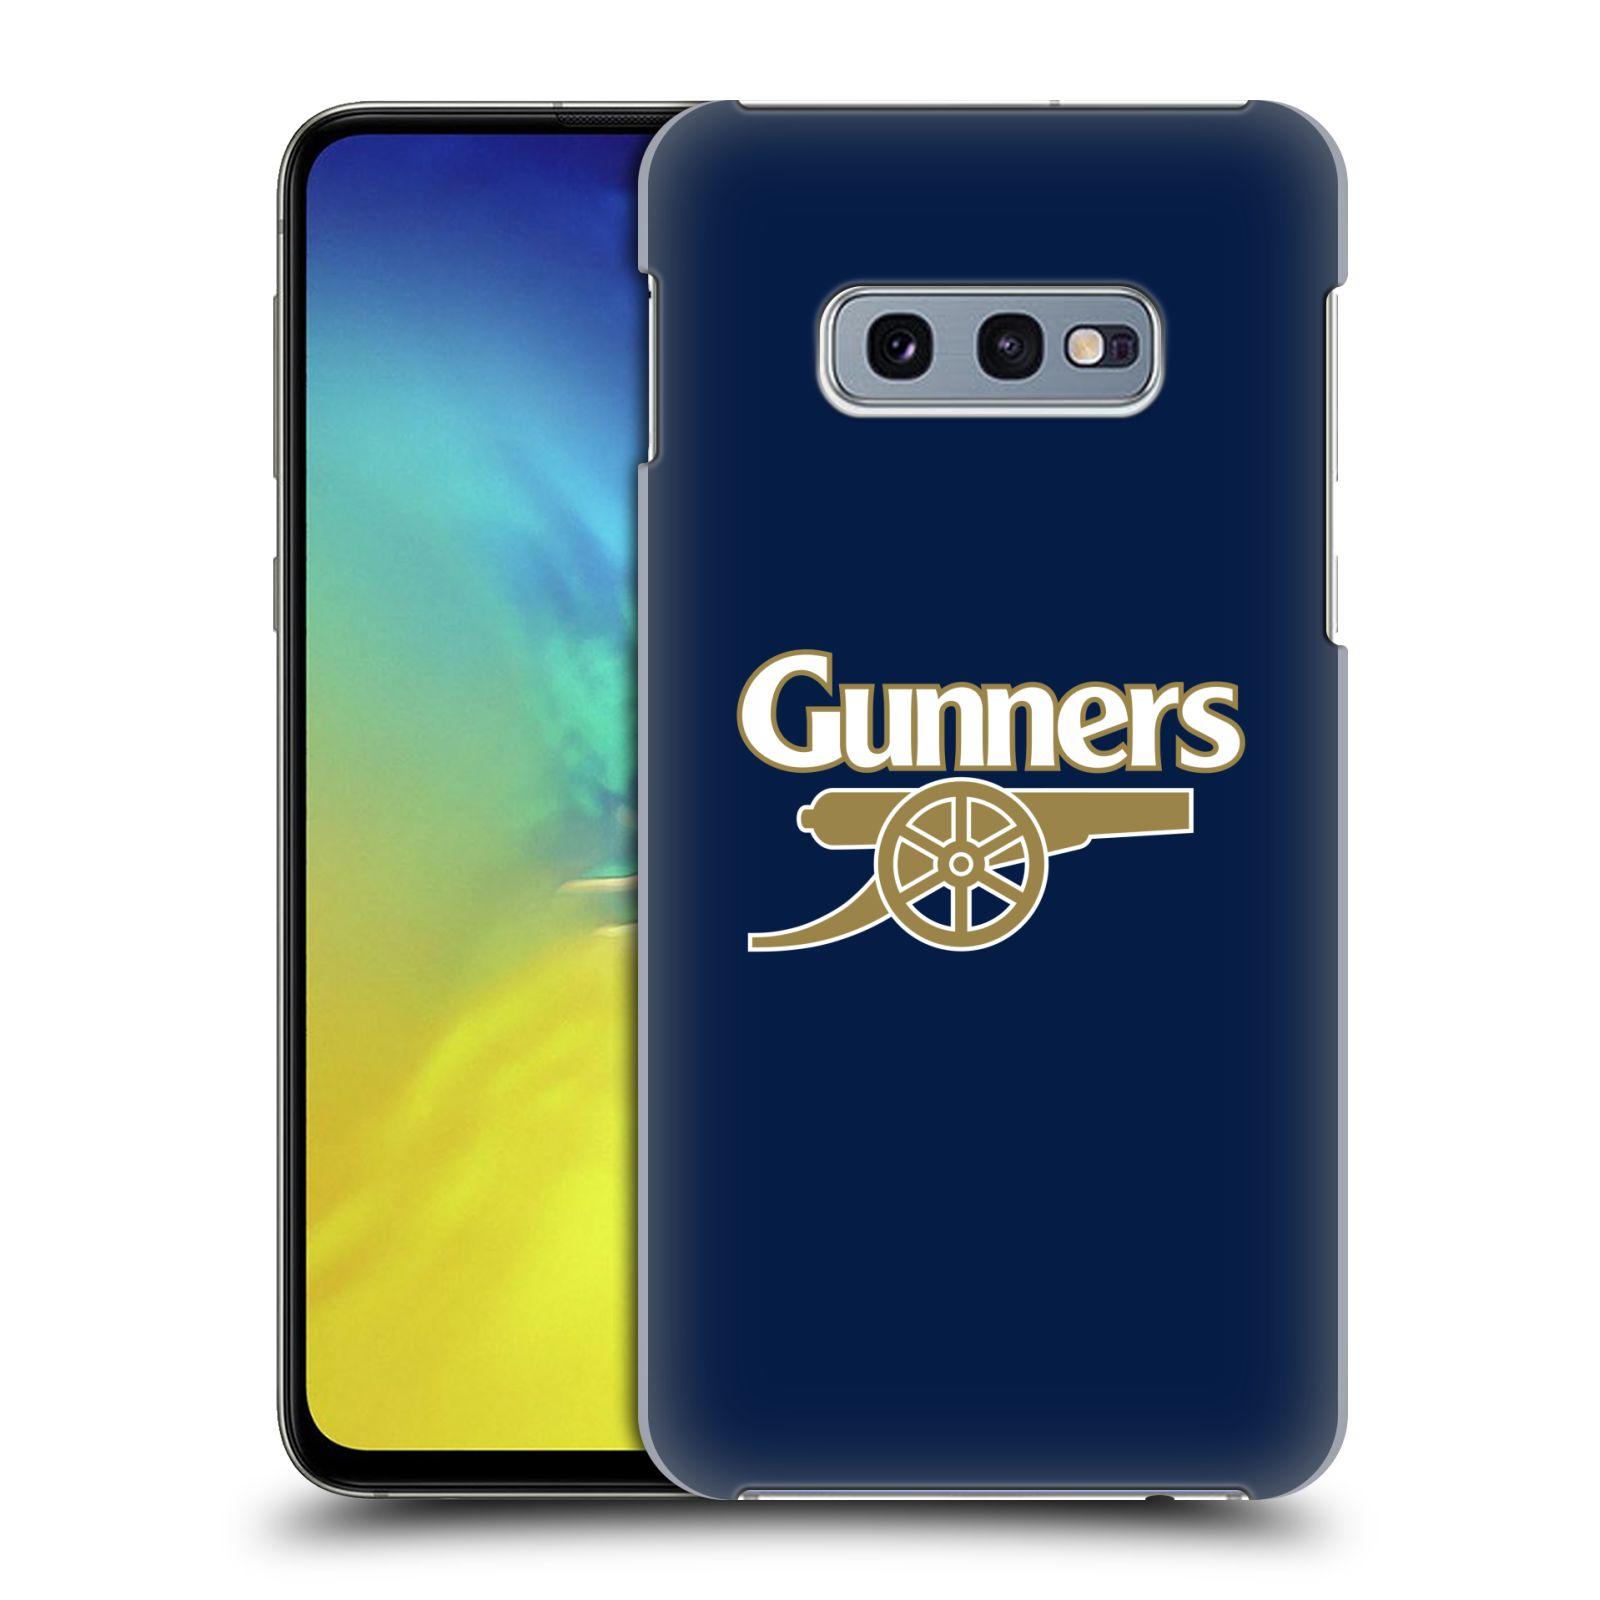 Plastové pouzdro na mobil Samsung Galaxy S10e - Head Case - Arsenal FC - Gunners